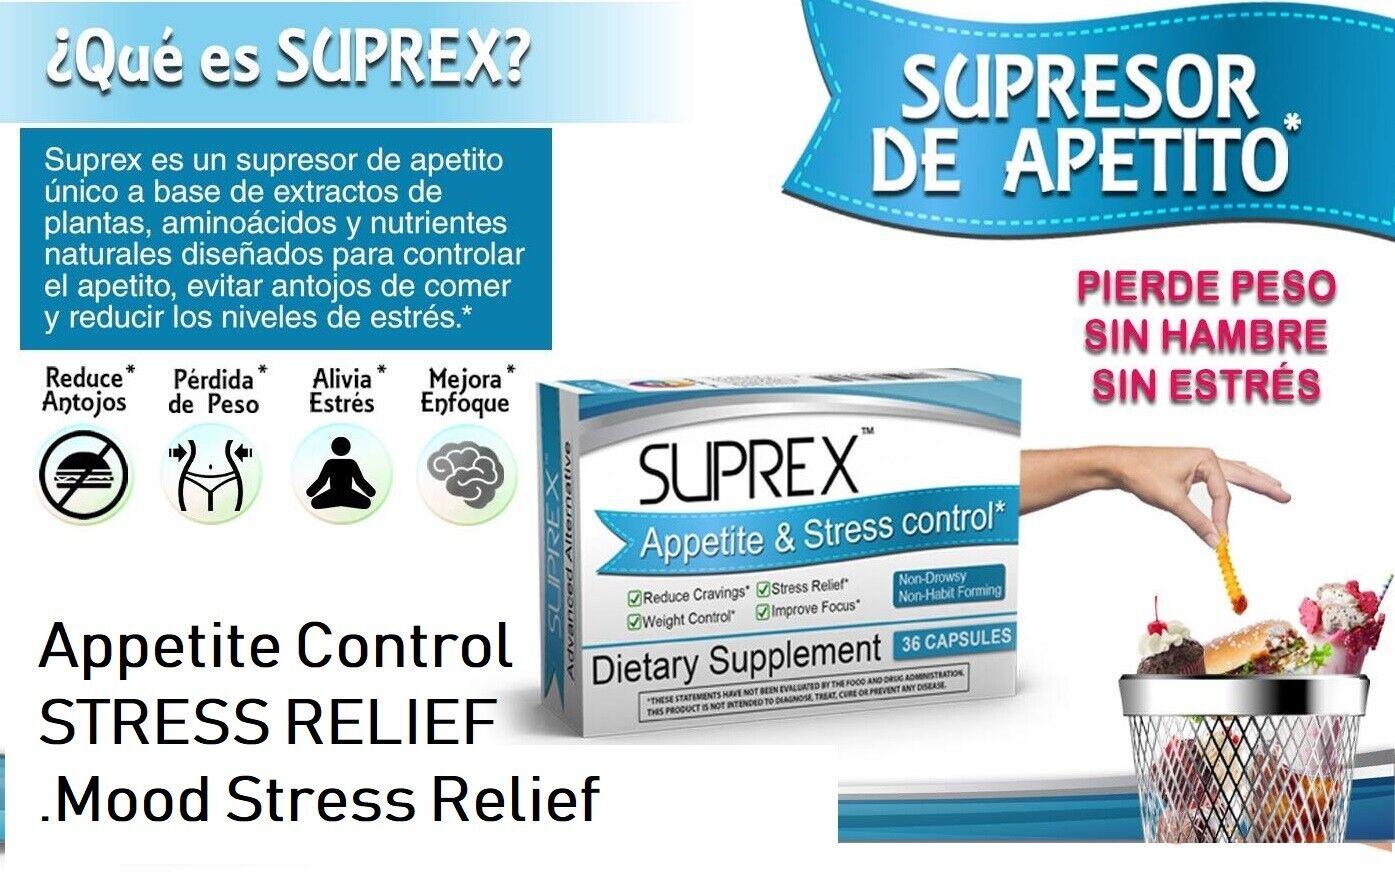 Suprex Appetite & Stress control Stress Relief Mood Appetite Control gluten % of 1